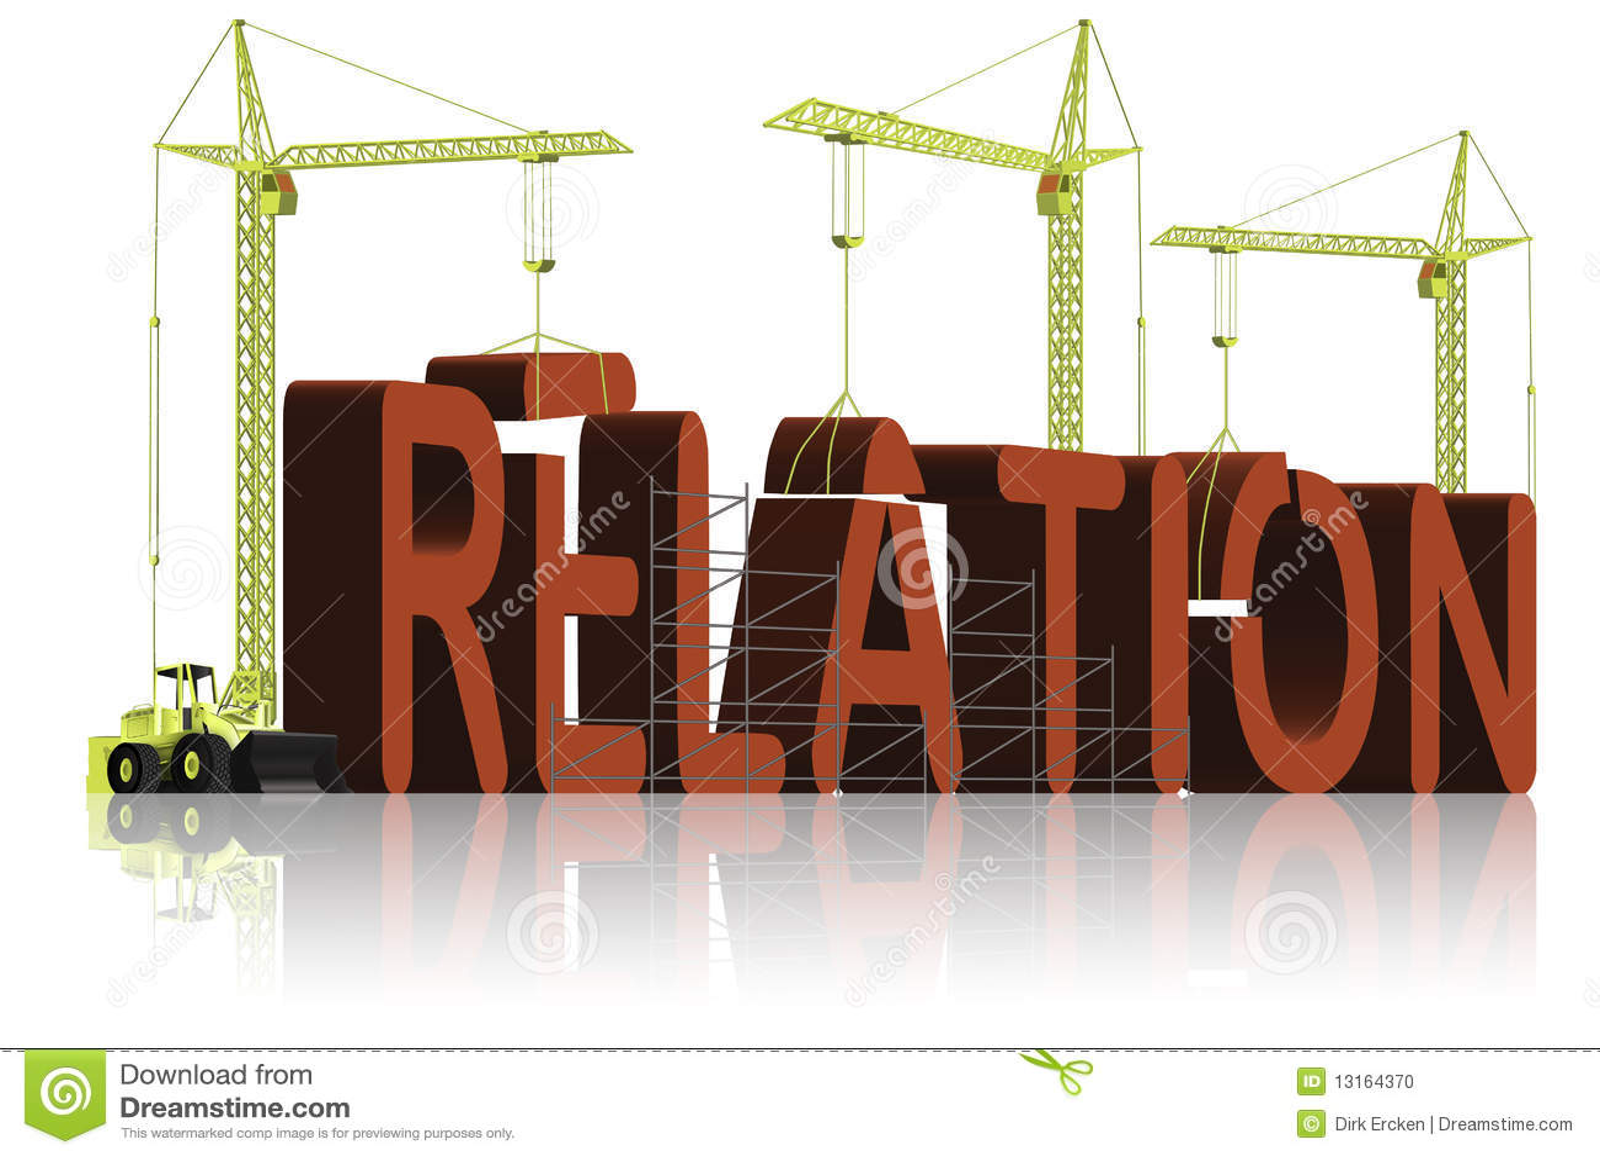 Relation Building Find Partner Love Relationship Stock Photo ...